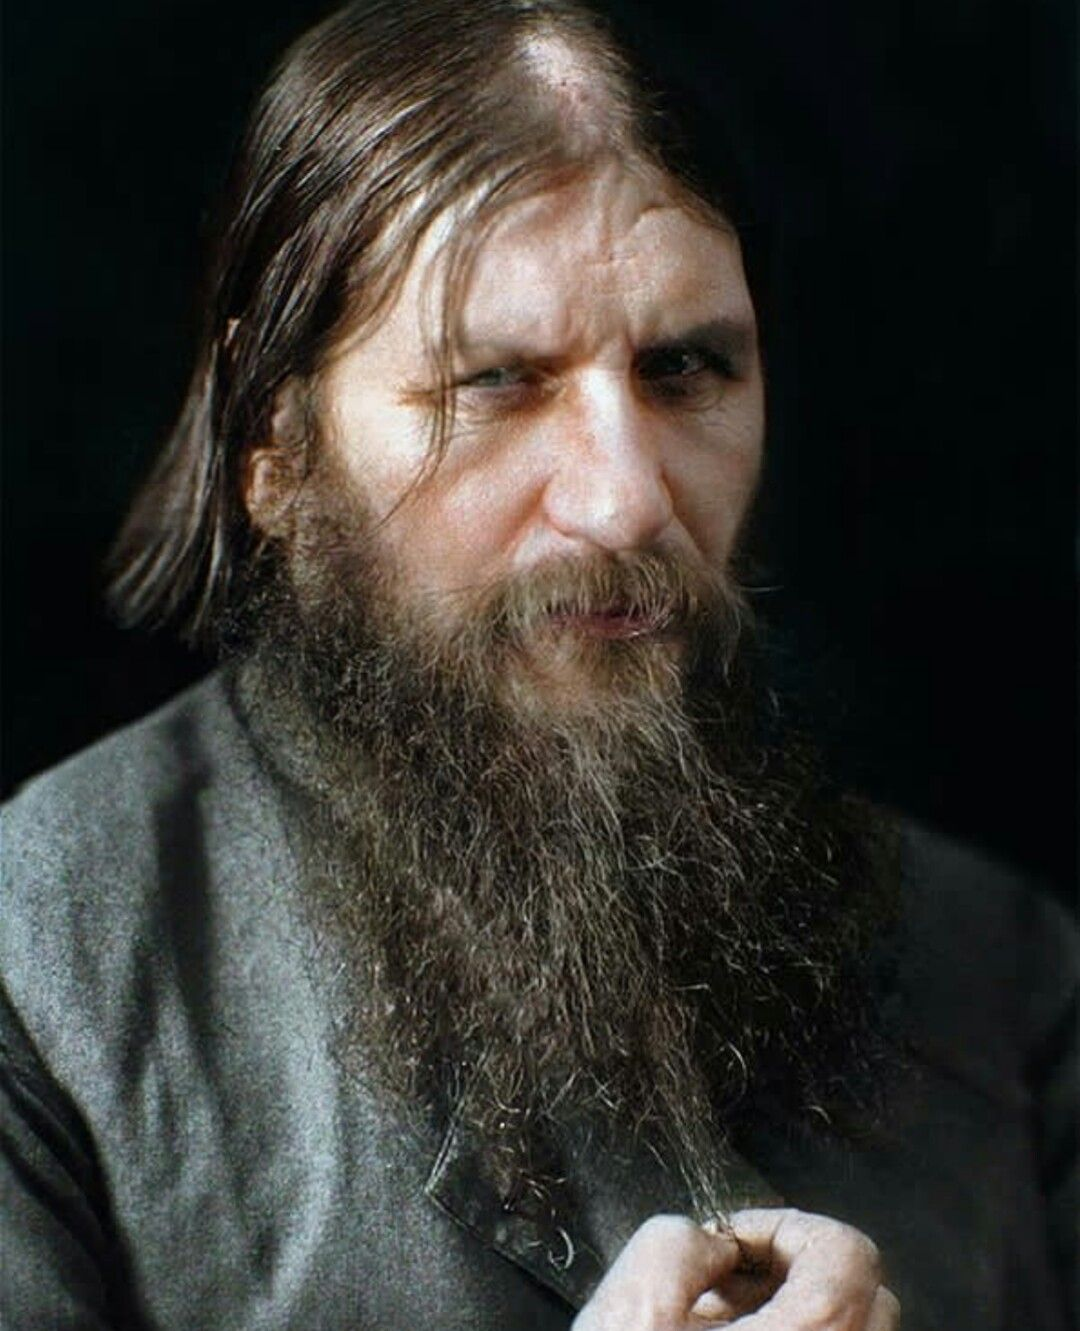 Grigori rasputin portrait | Digital artists, Colorized